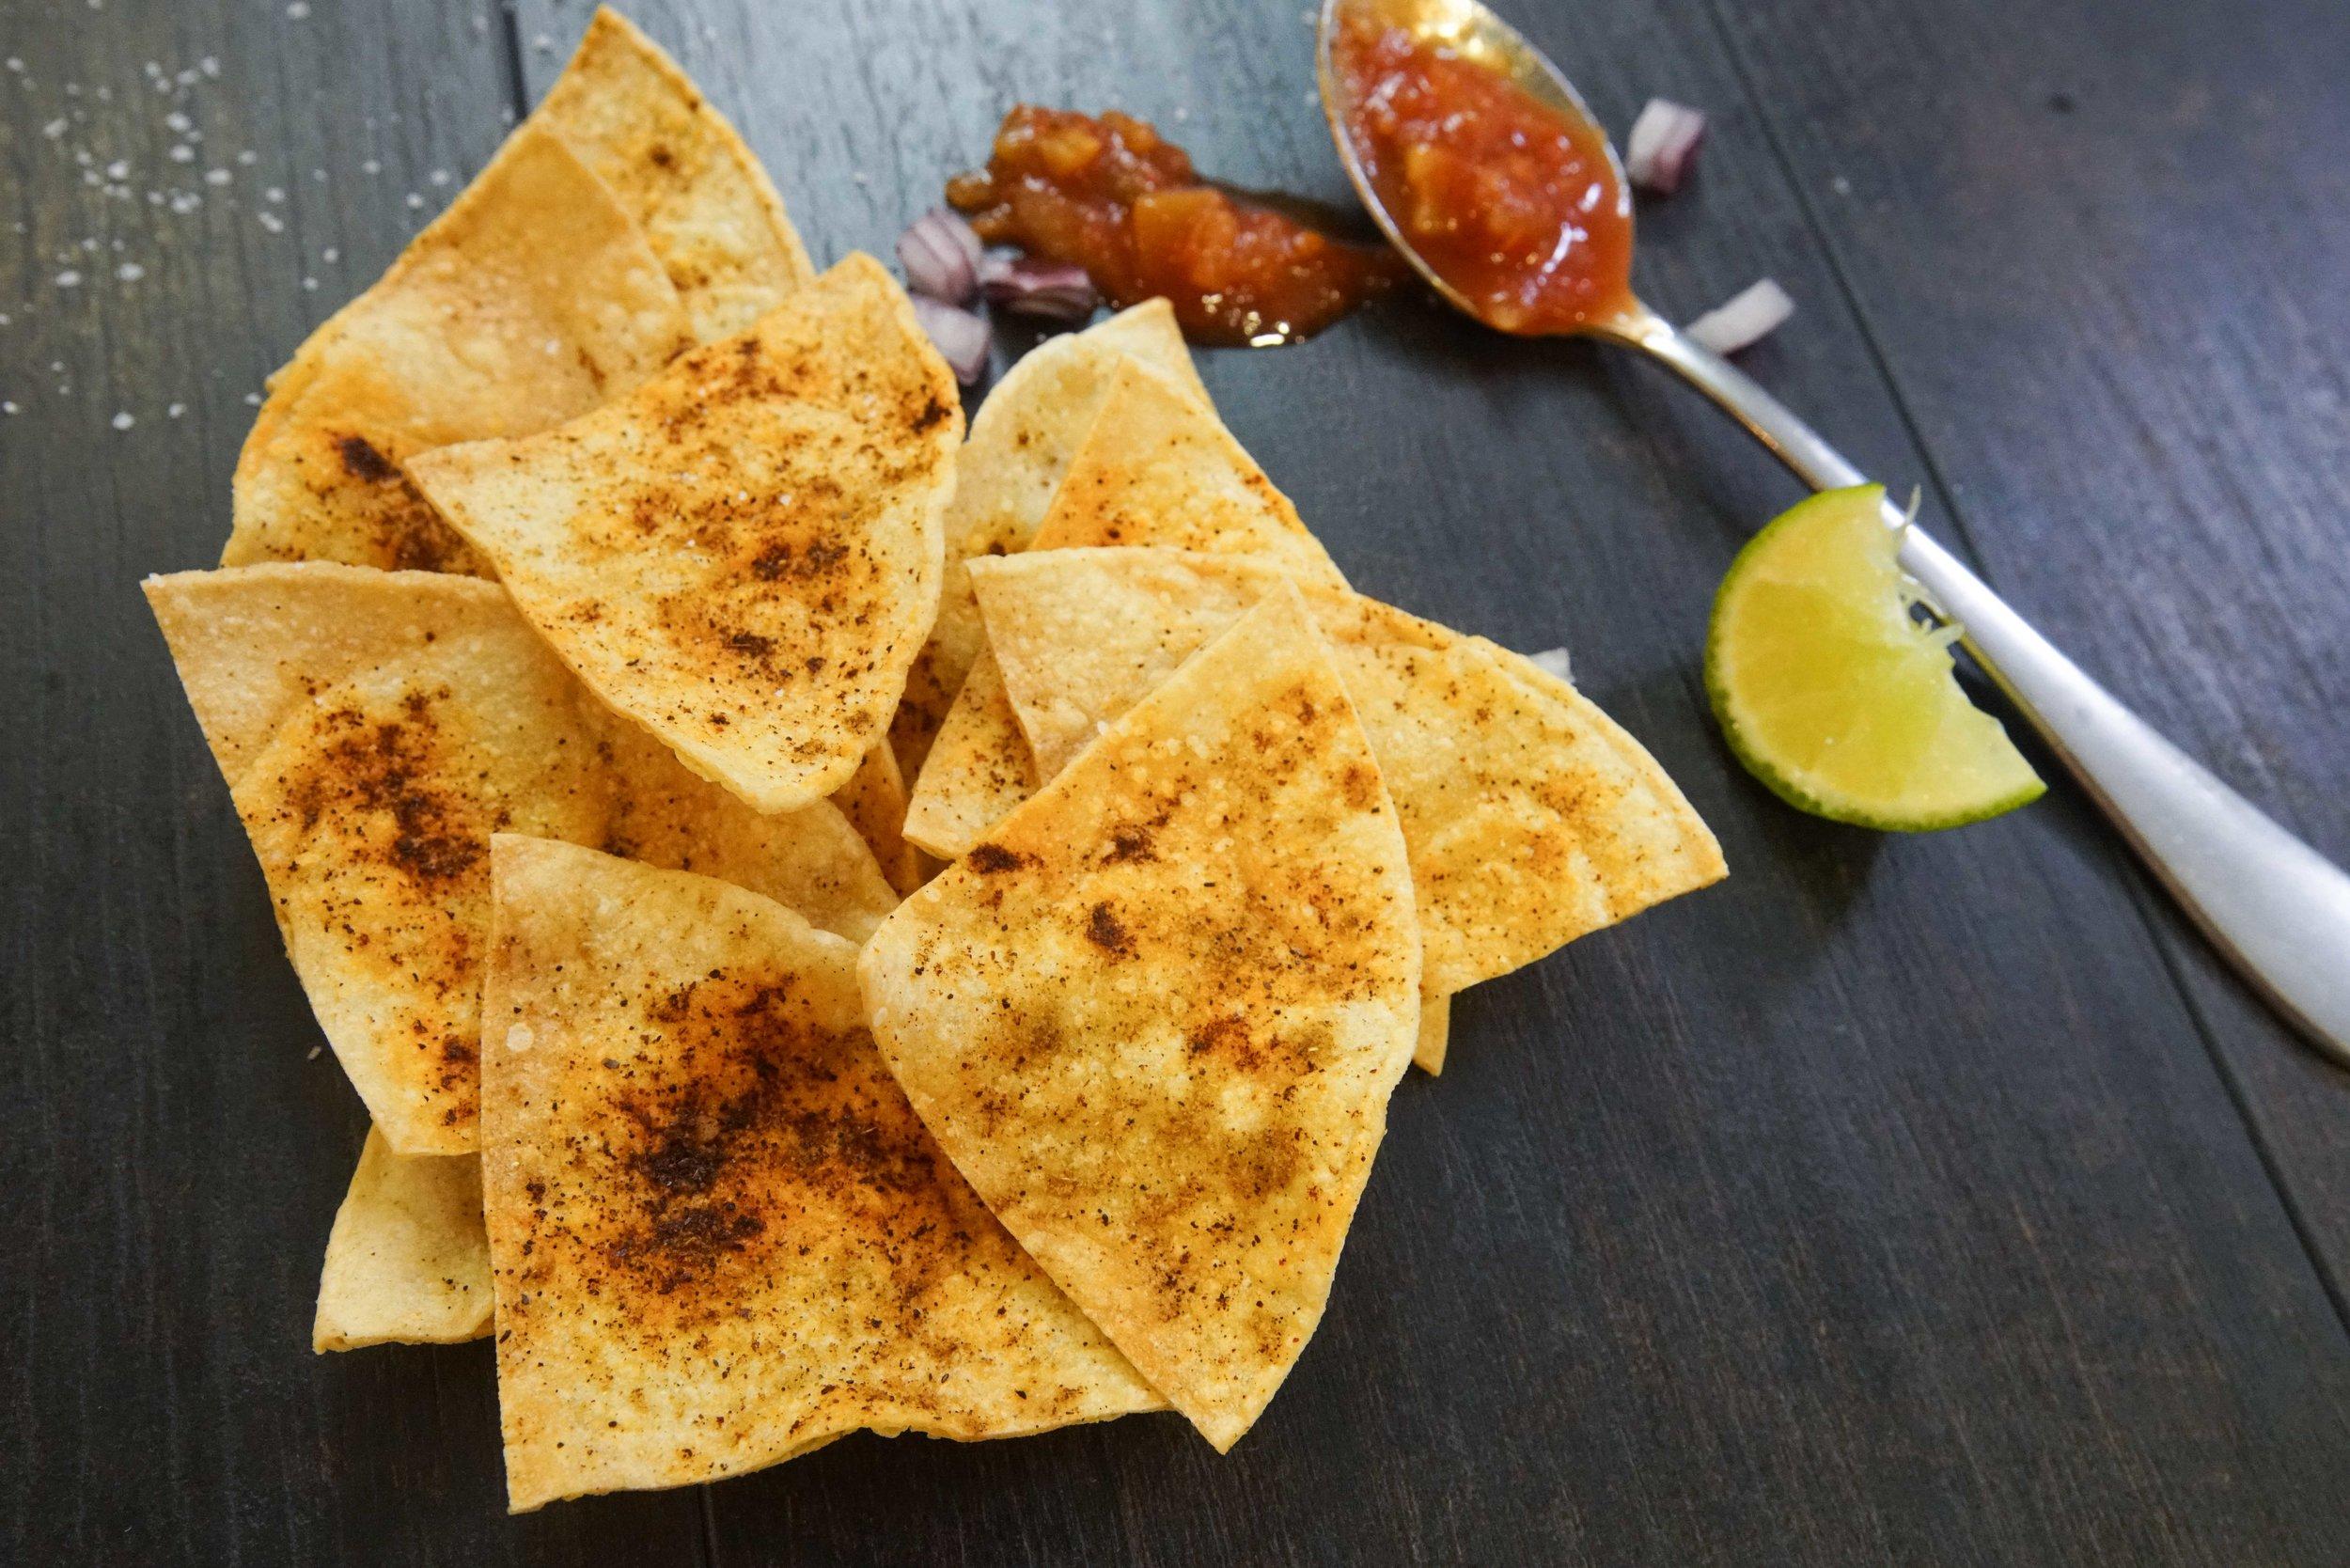 homemade tortilla chips stcgo